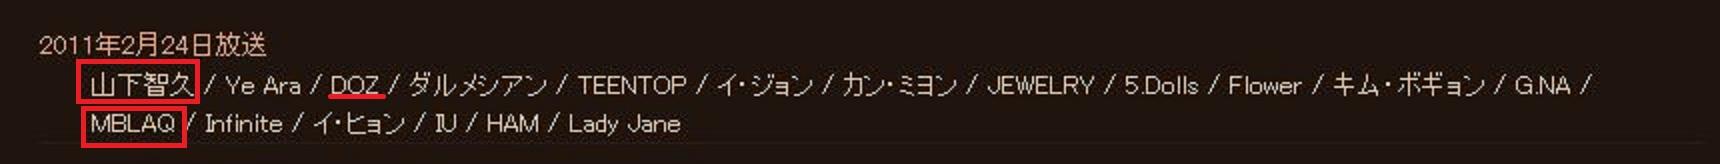 Making the BLAQ STYLE (rain edit)日本語字幕_c0047605_1854276.jpg